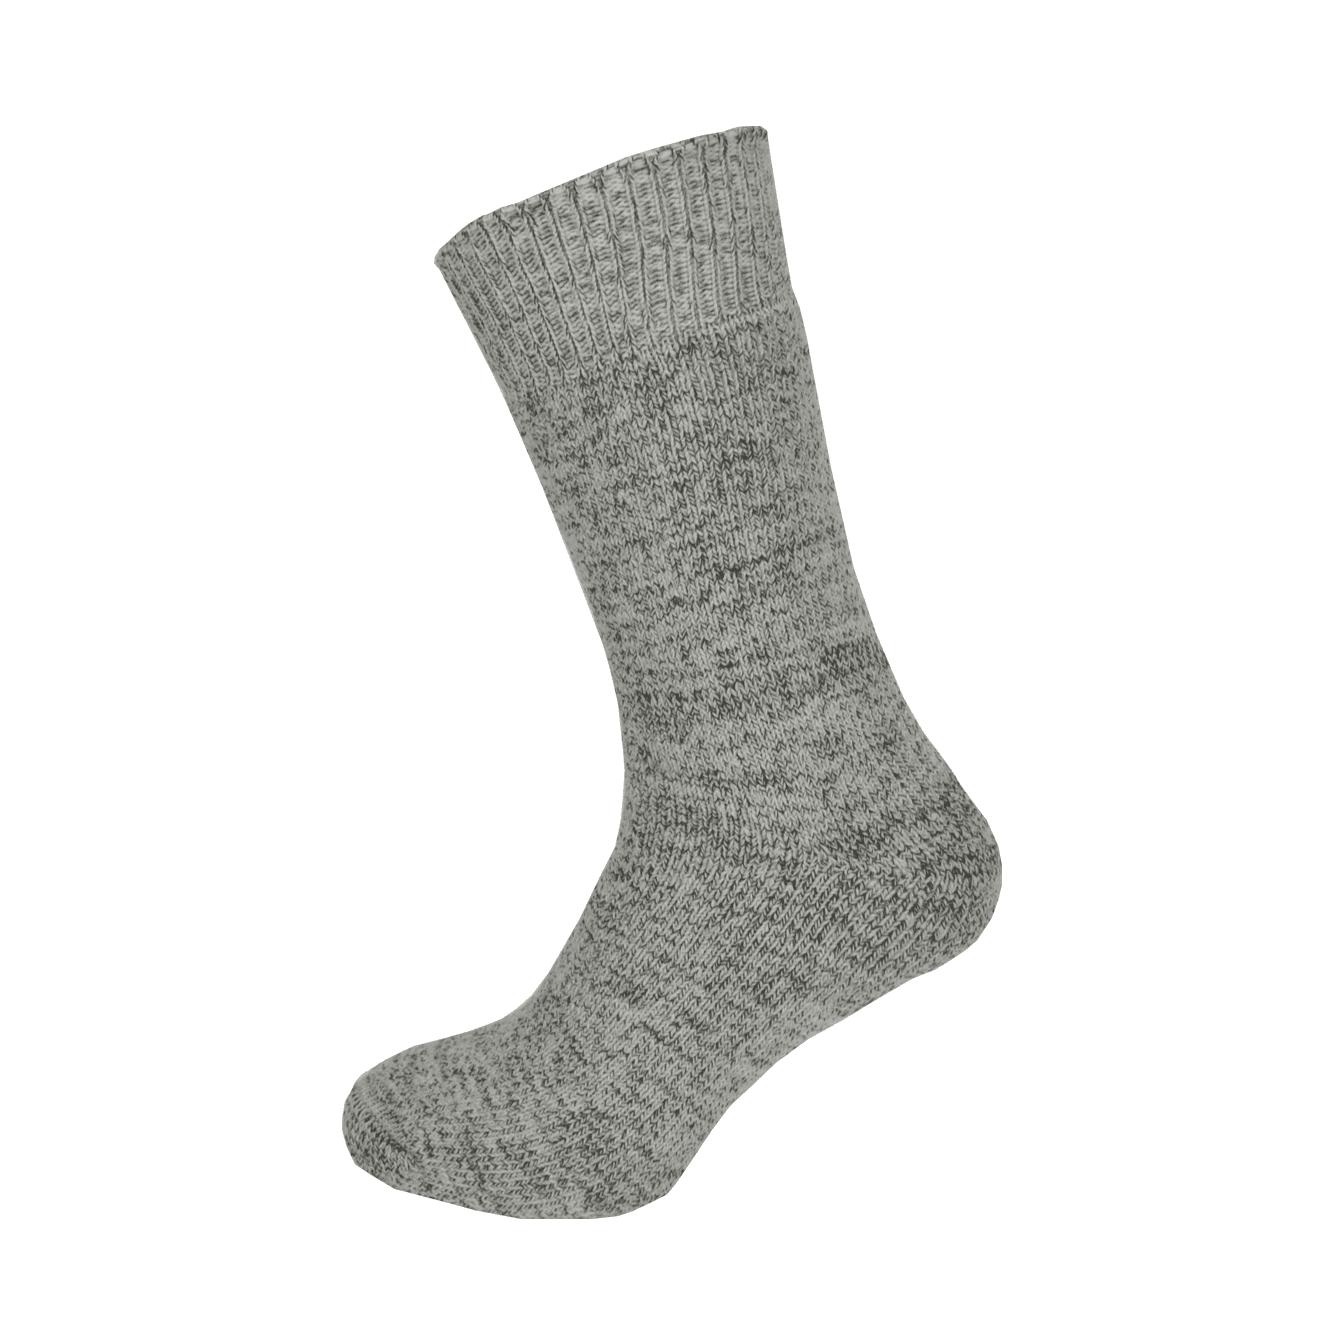 Macfarlaine all Terry Fleck Sock Grey / Brown